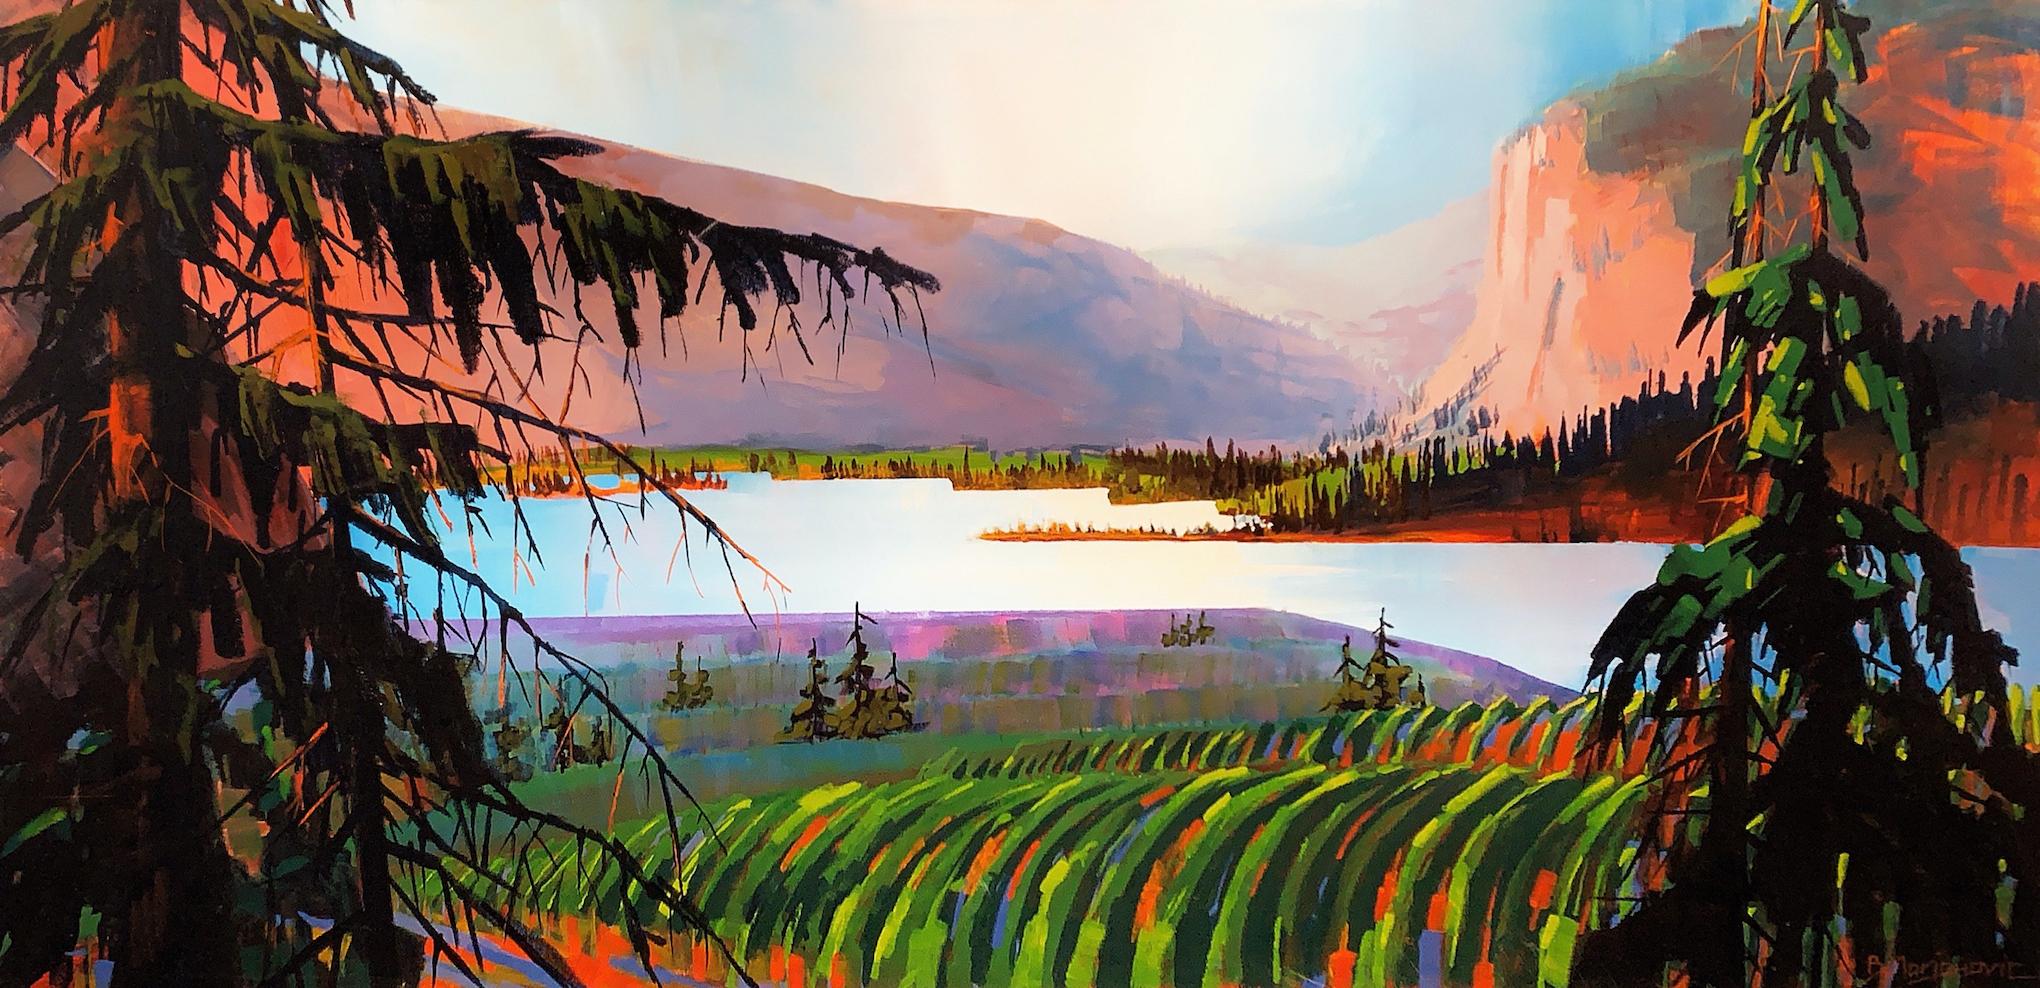 Blue Mountains Winery... by  Branko Marjanovic - Masterpiece Online